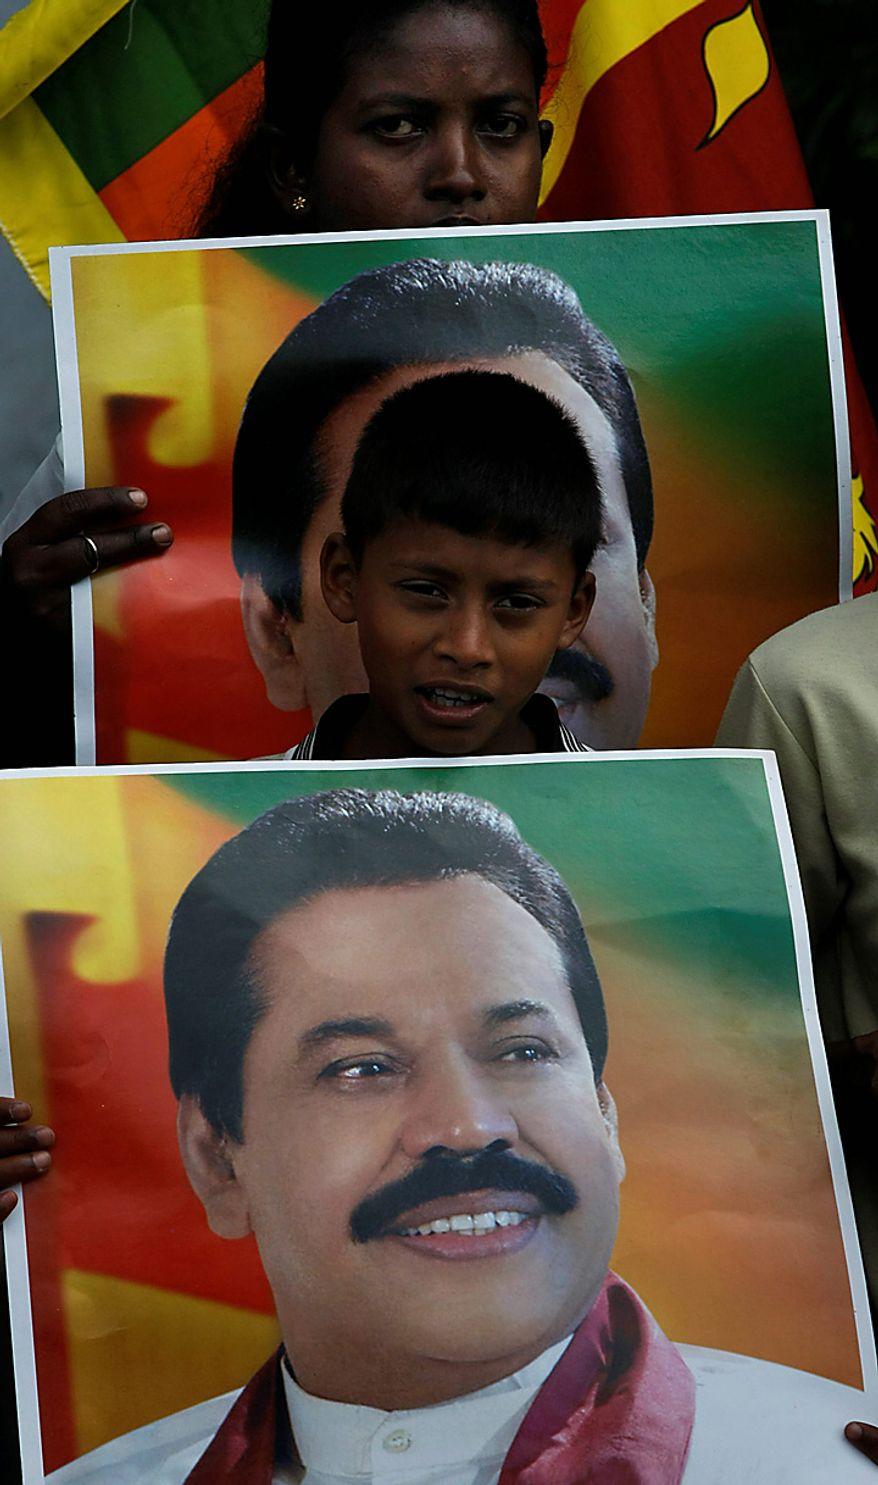 ** FILE ** A Sri Lankan boy supporting President Mahinda Rajapaksha holds his poster as they rally around the parliament complex in Colombo, Sri Lanka, Wednesday, Sept. 8, 2010. (AP Photo/Eranga Jayawardena)